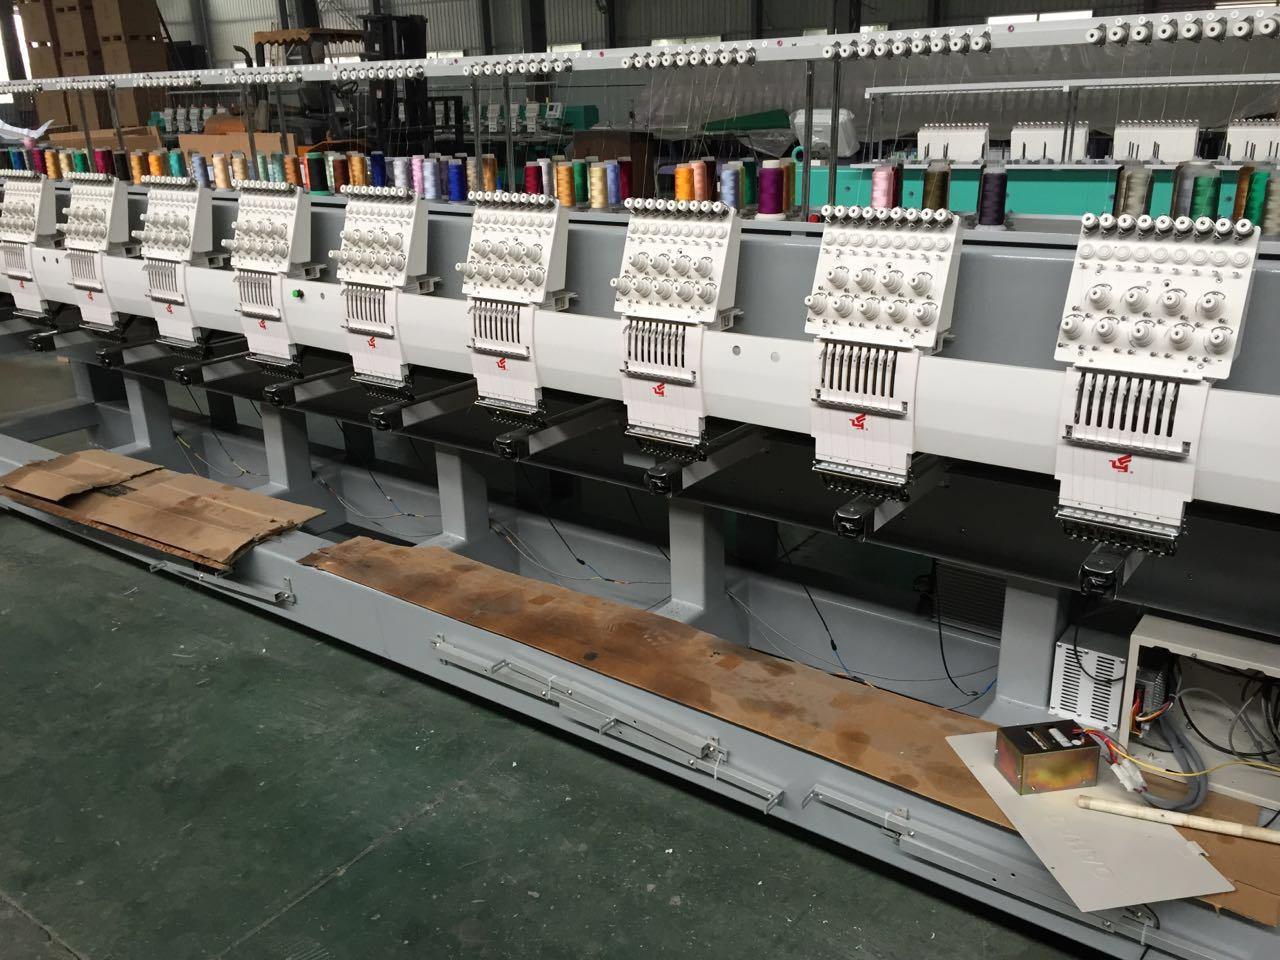 Hye-He1512 High Speed Computerized Embroidery Machine